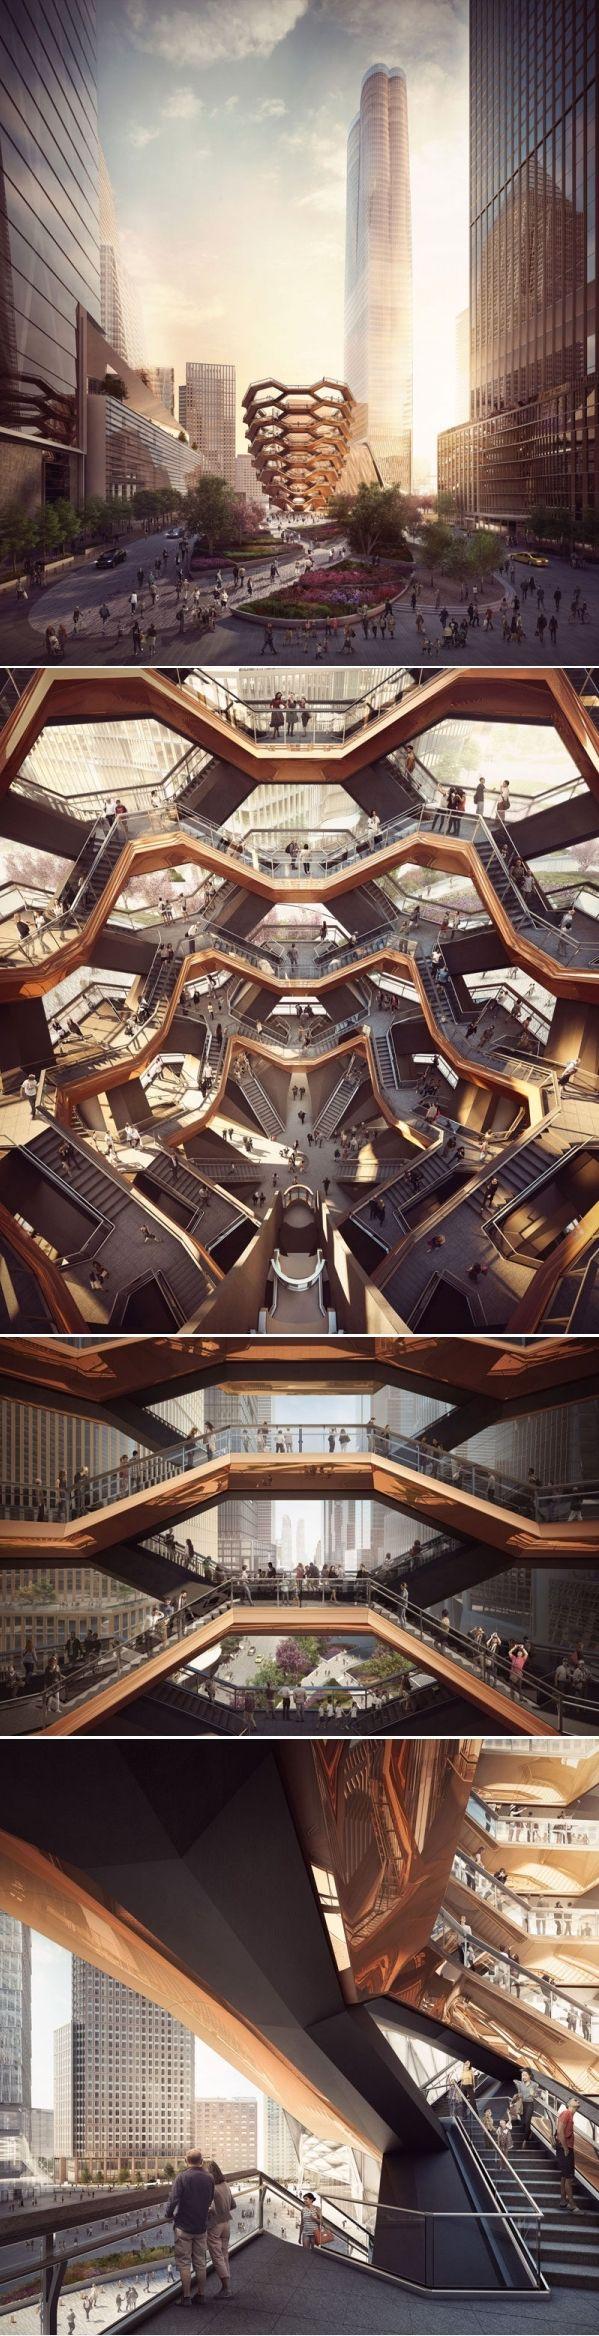 Vessel Will Be A New Public Landmark In Manhattan in 2018 | CONTEMPORIST